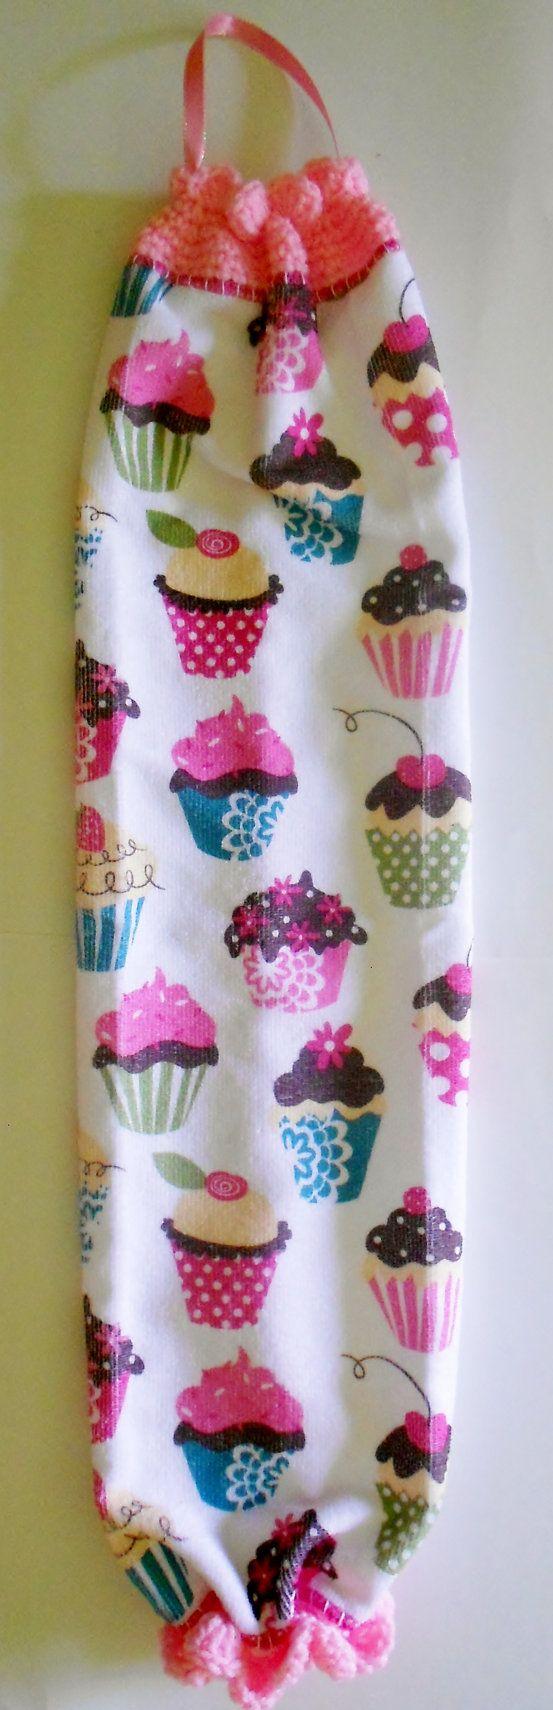 Bag Holder Cupcake Kitchen Decor Crochet By Easttennesseecrafts 12 00